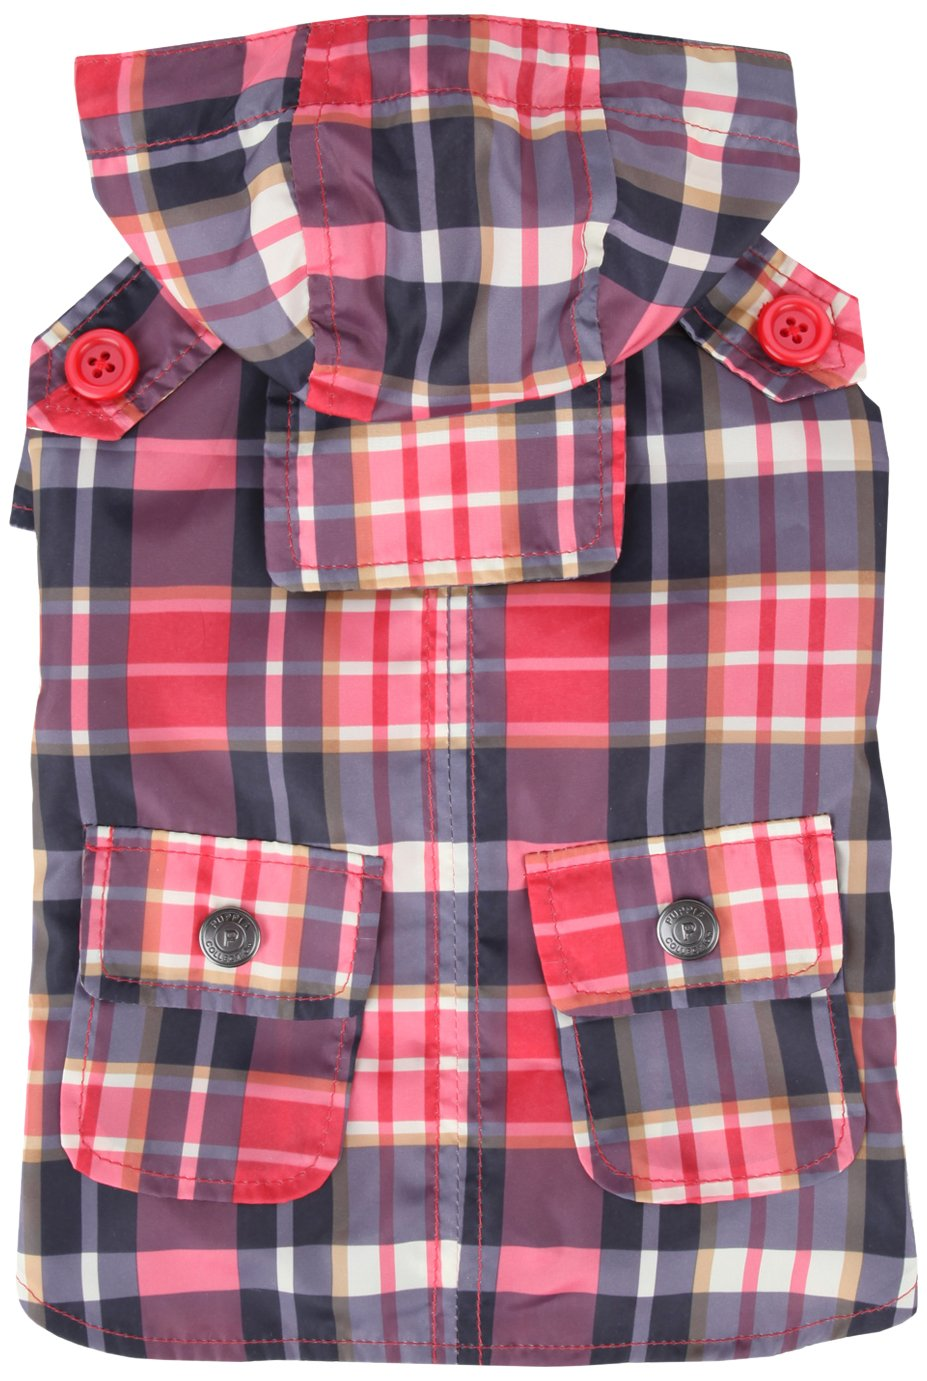 Puppia Barrington Raincoat, Small, Red